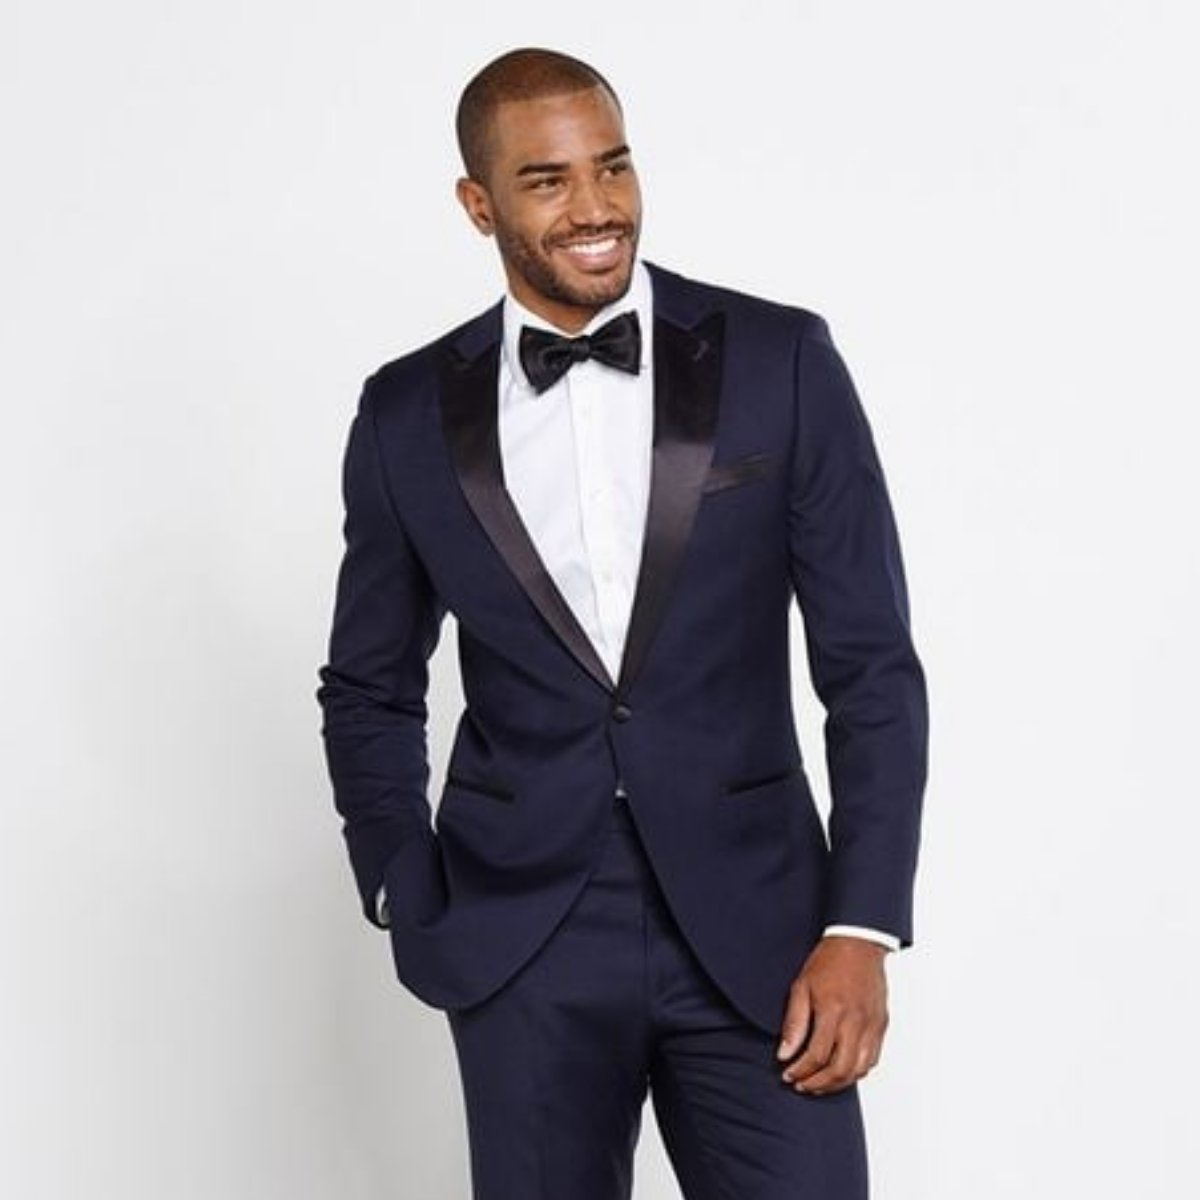 d5a0ad9ea8 Warehouse Suit Sale on Twitter